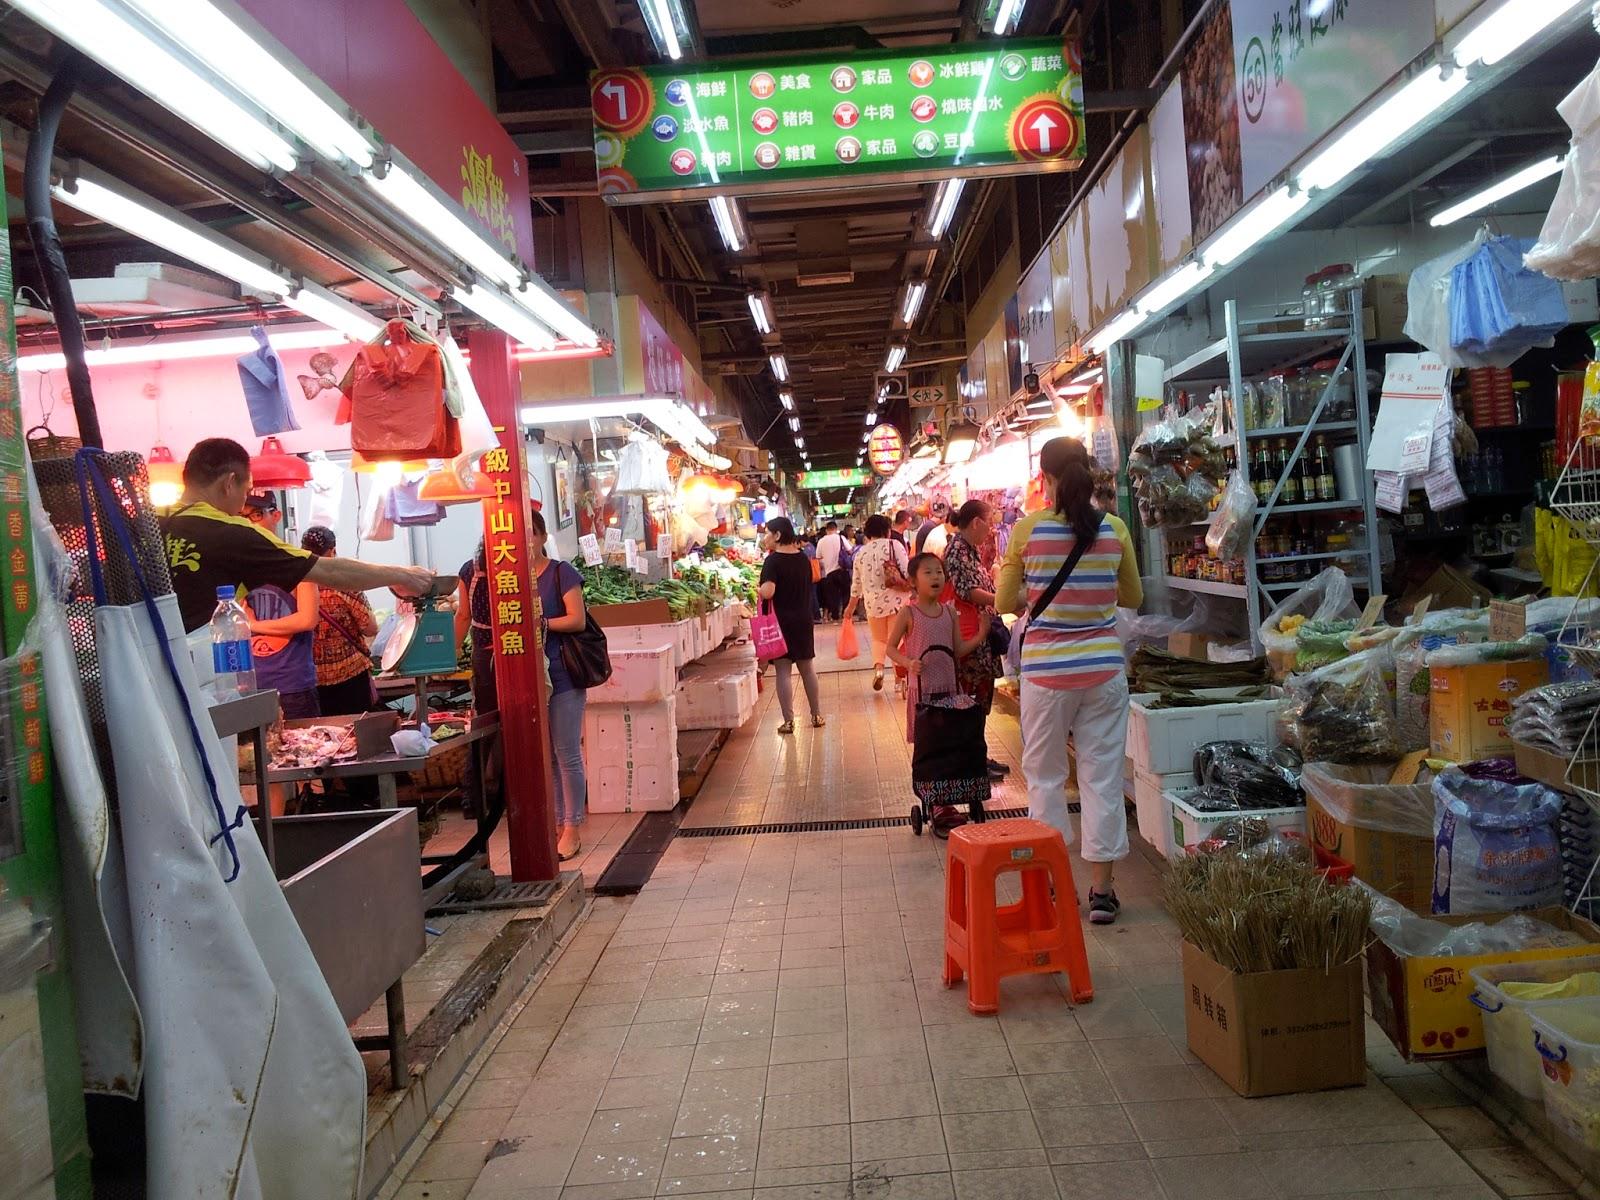 Grassroots O2: [領匯商場] 鯉魚門廣場 @2015-05-25